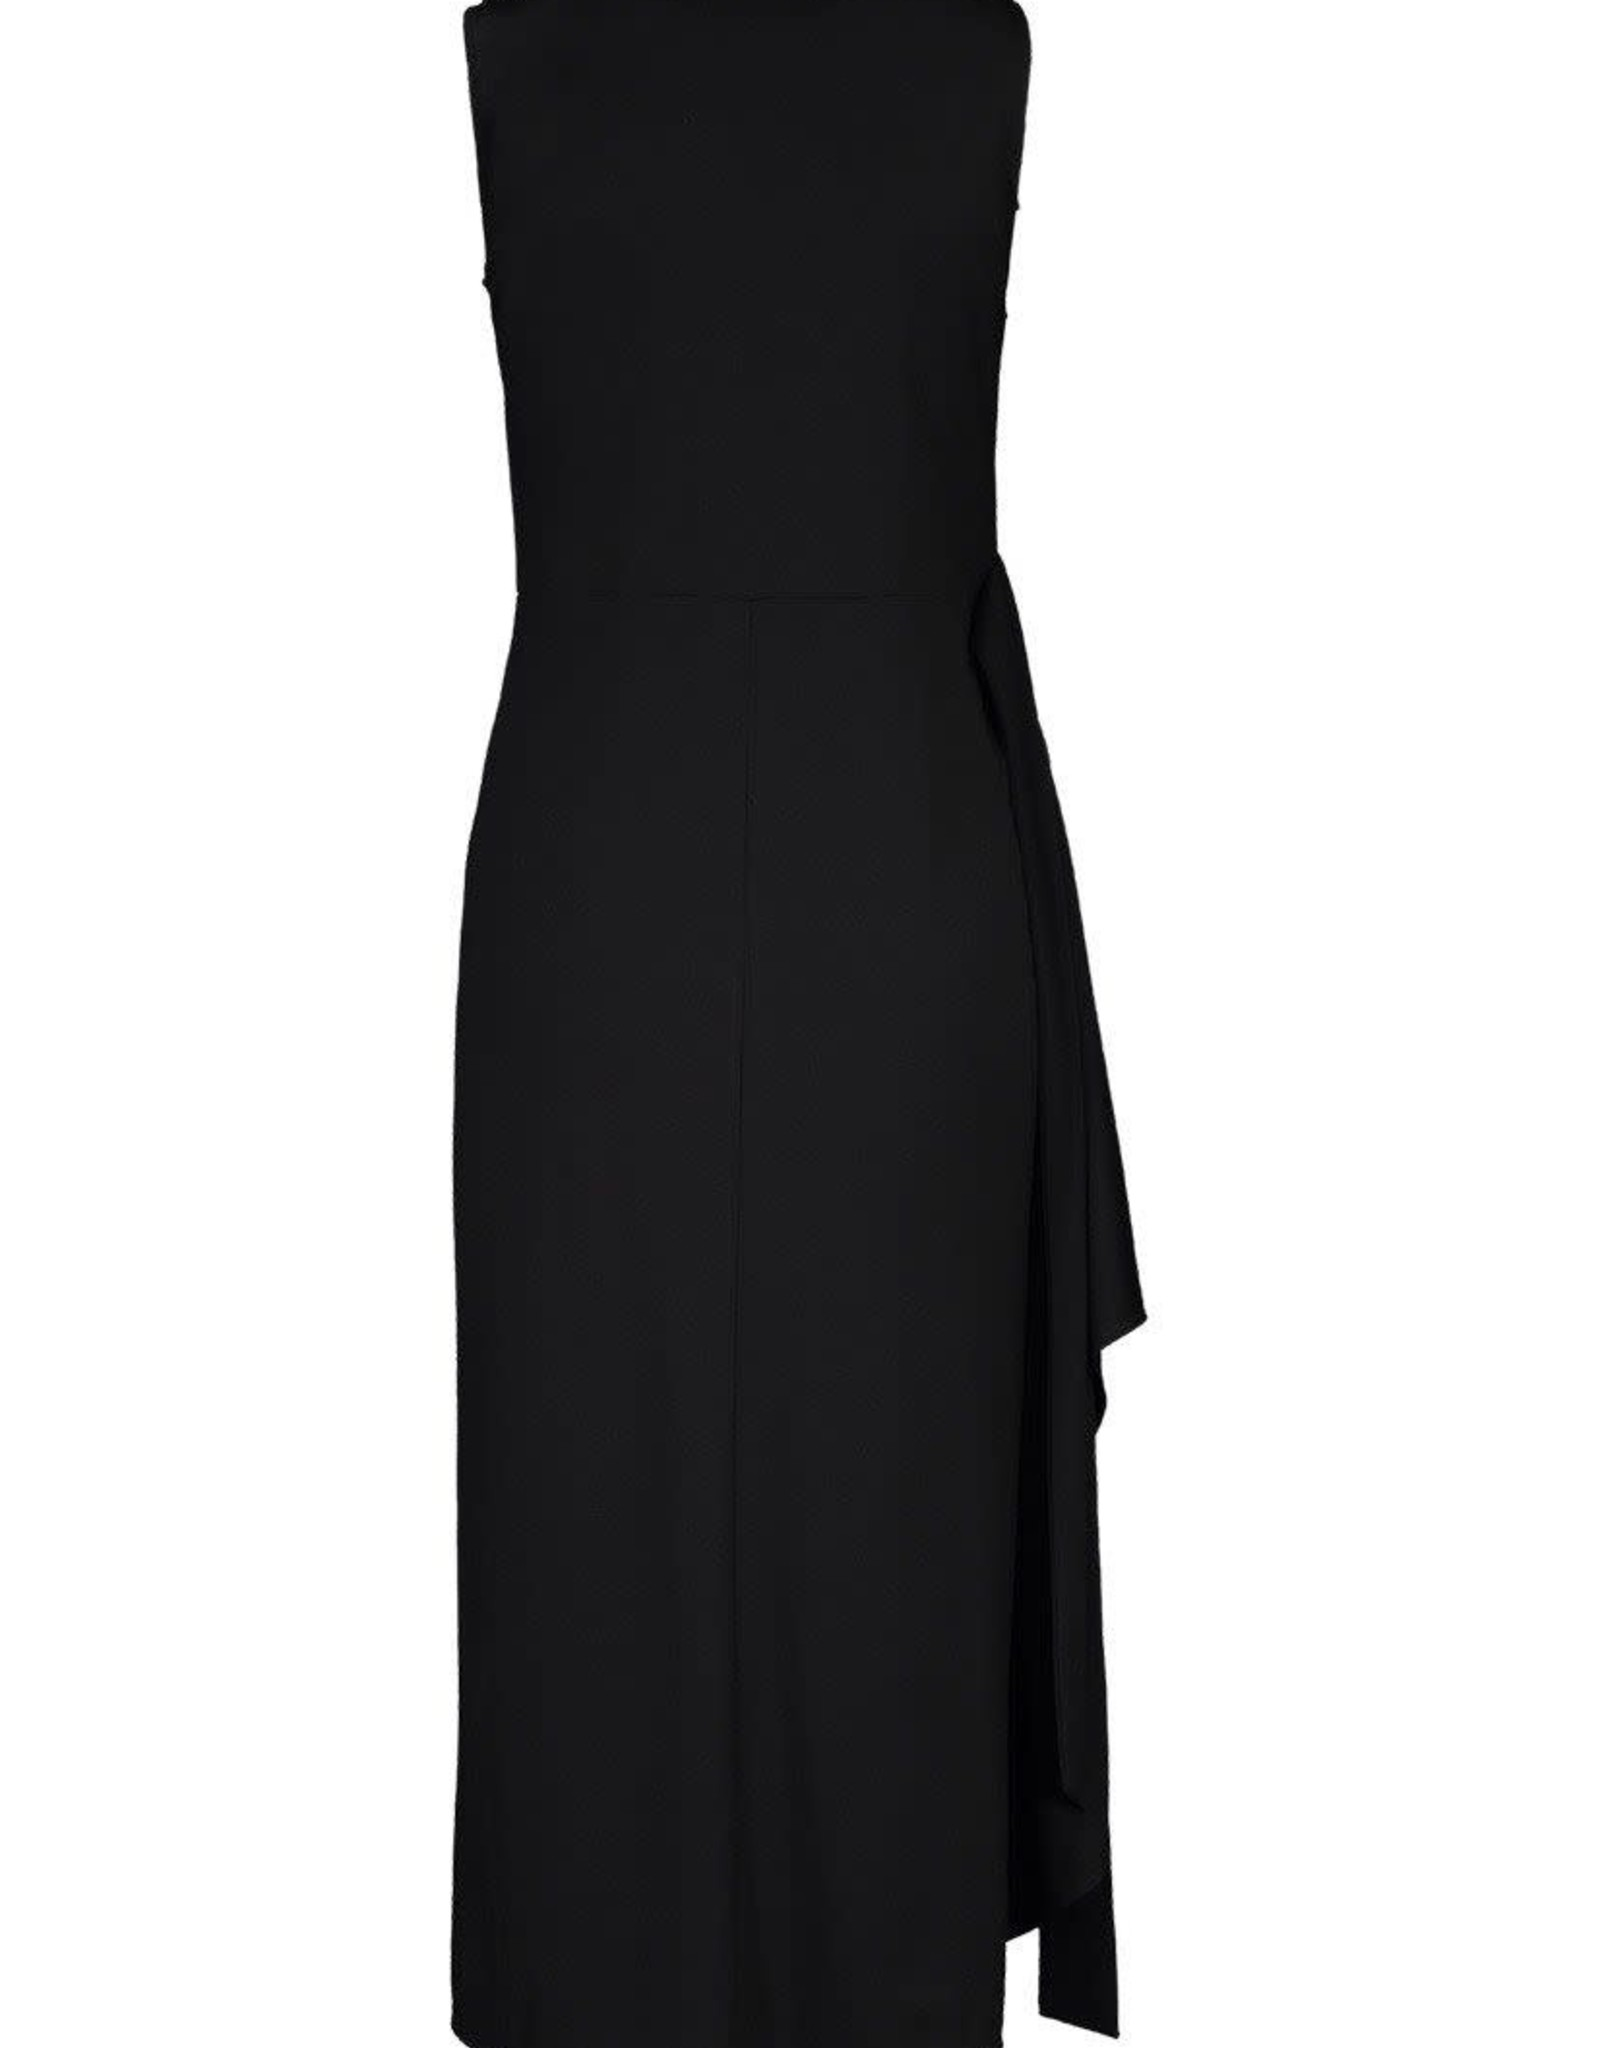 Tribal Black Sleeveless Wrap Dress